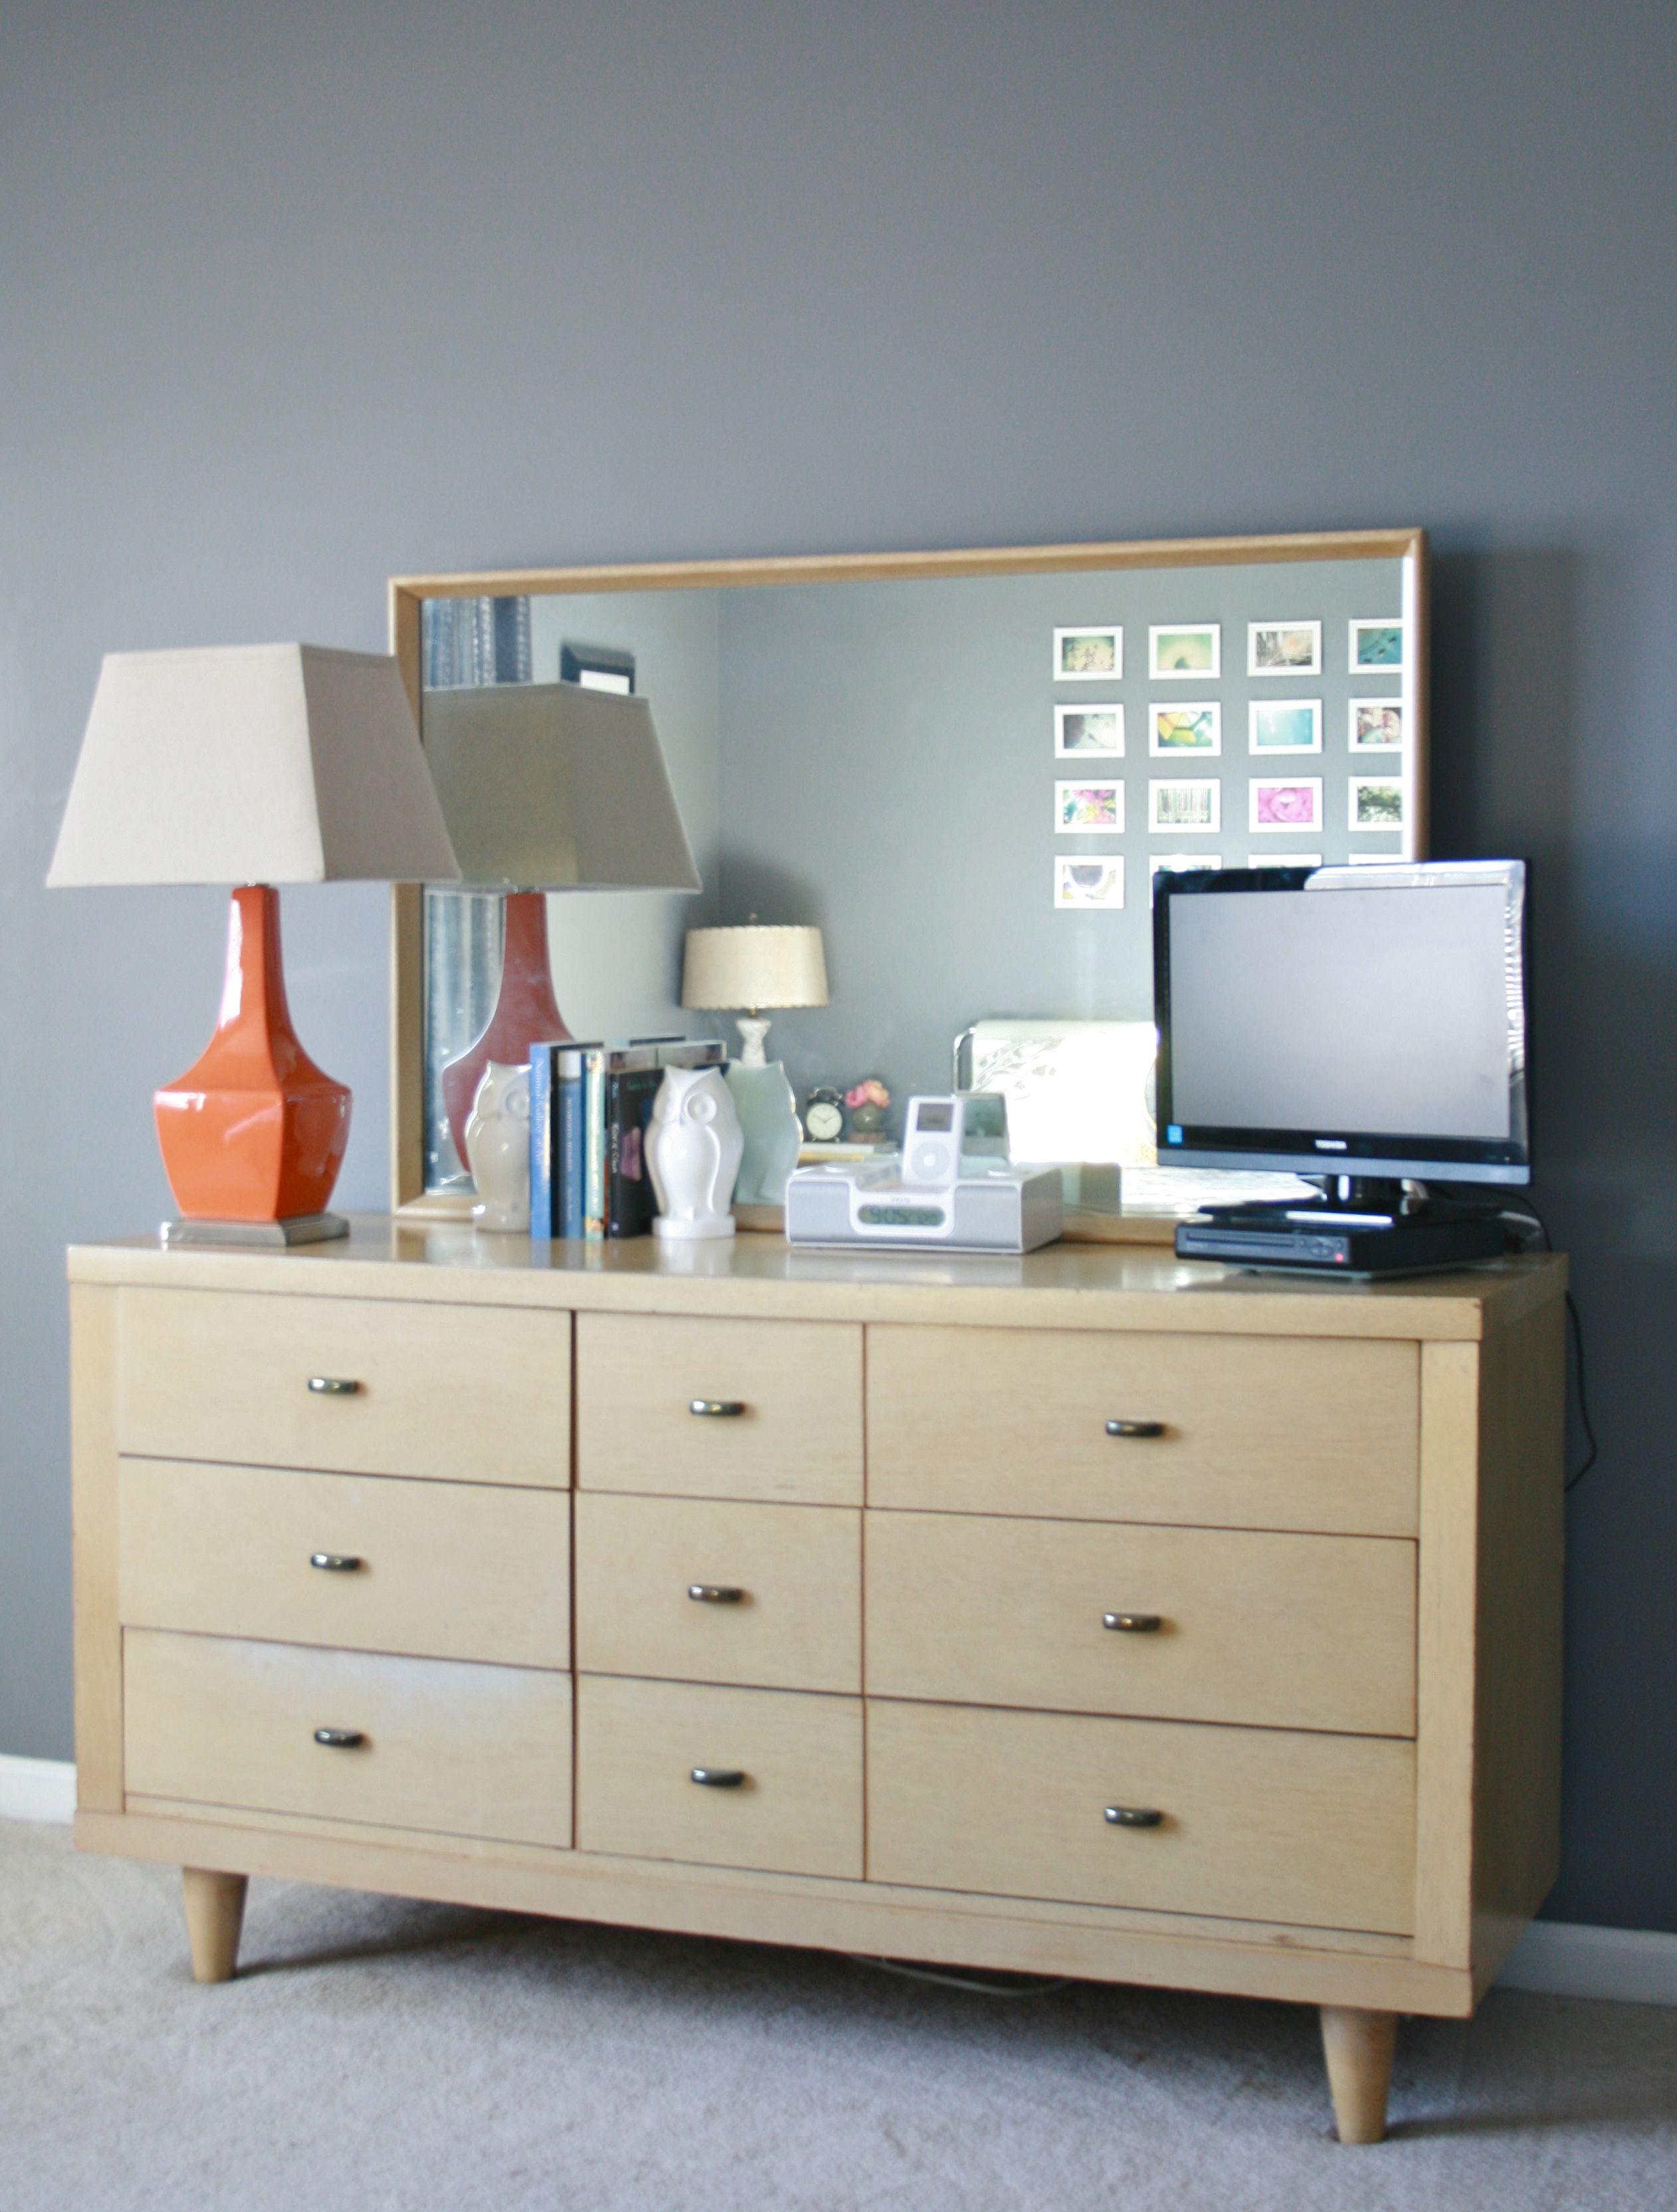 Fullsize Of Mid Century Bedroom